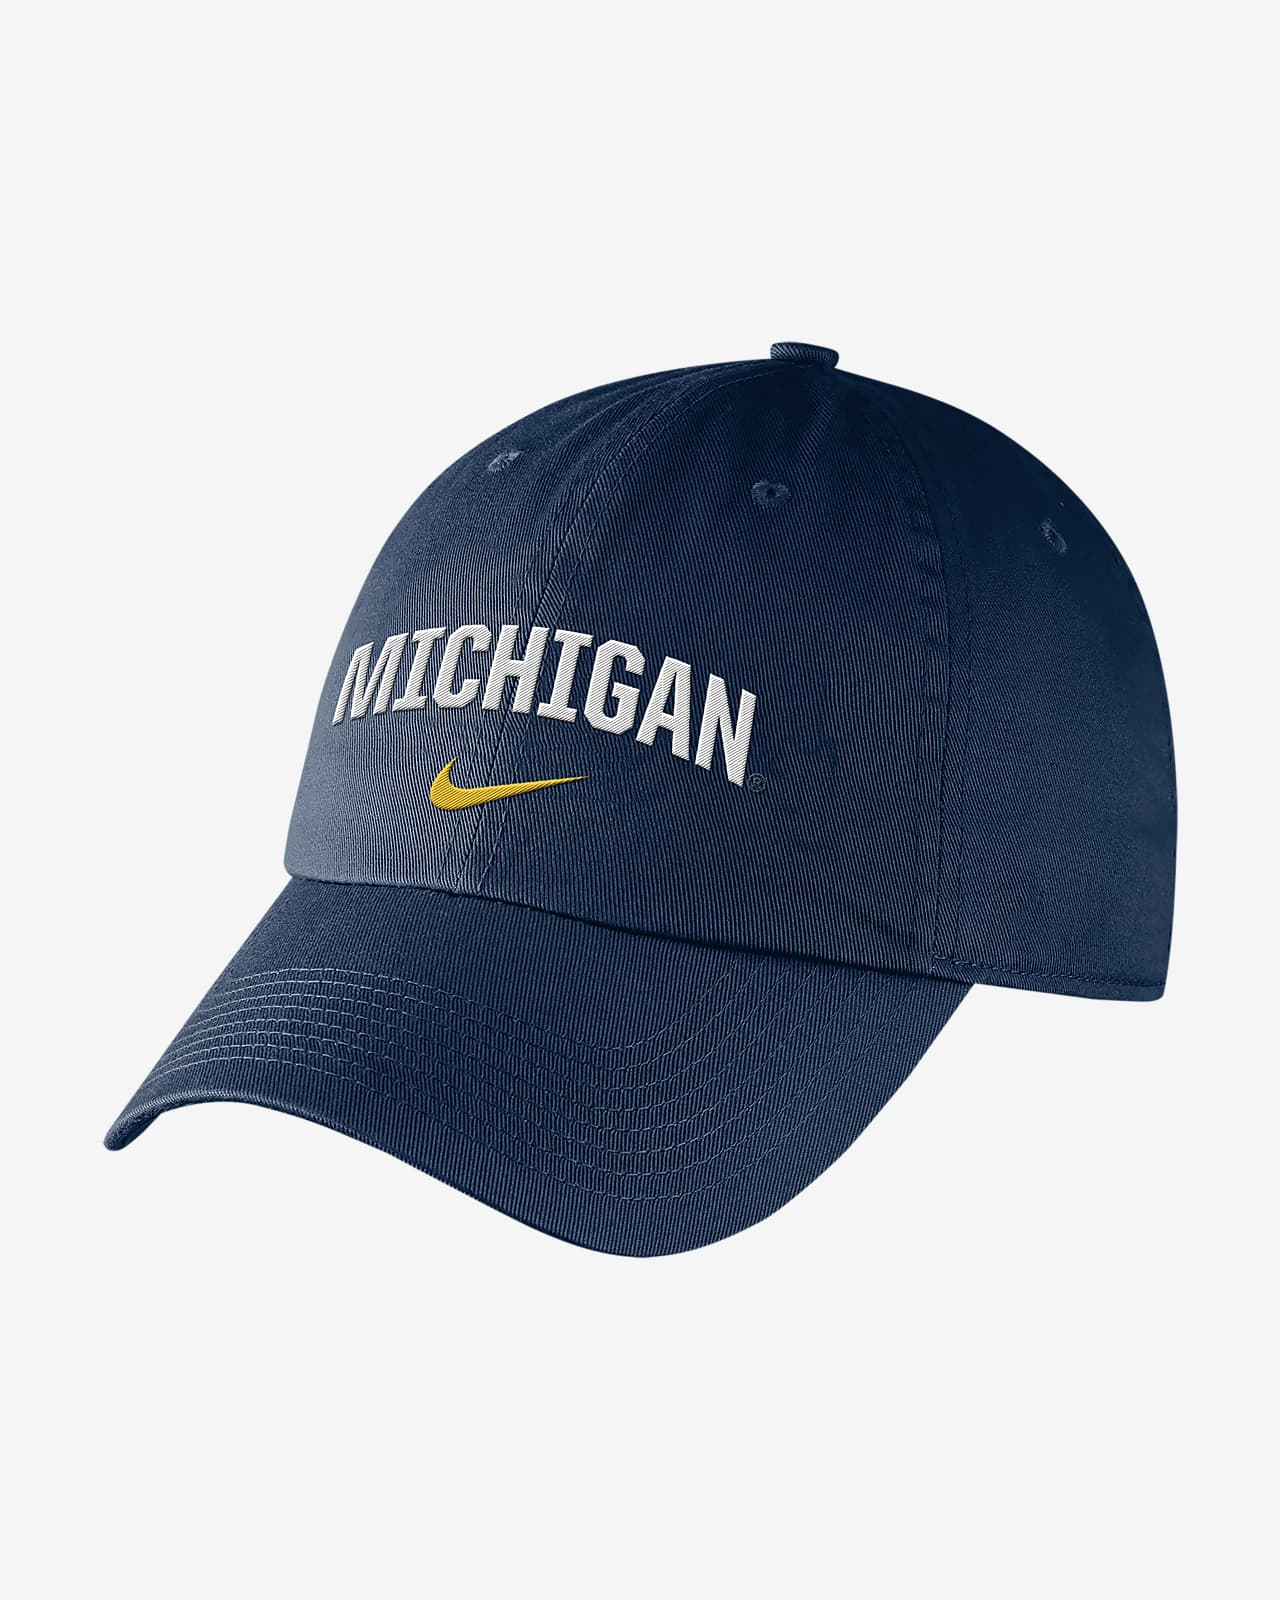 Nike College (Michigan) Hat